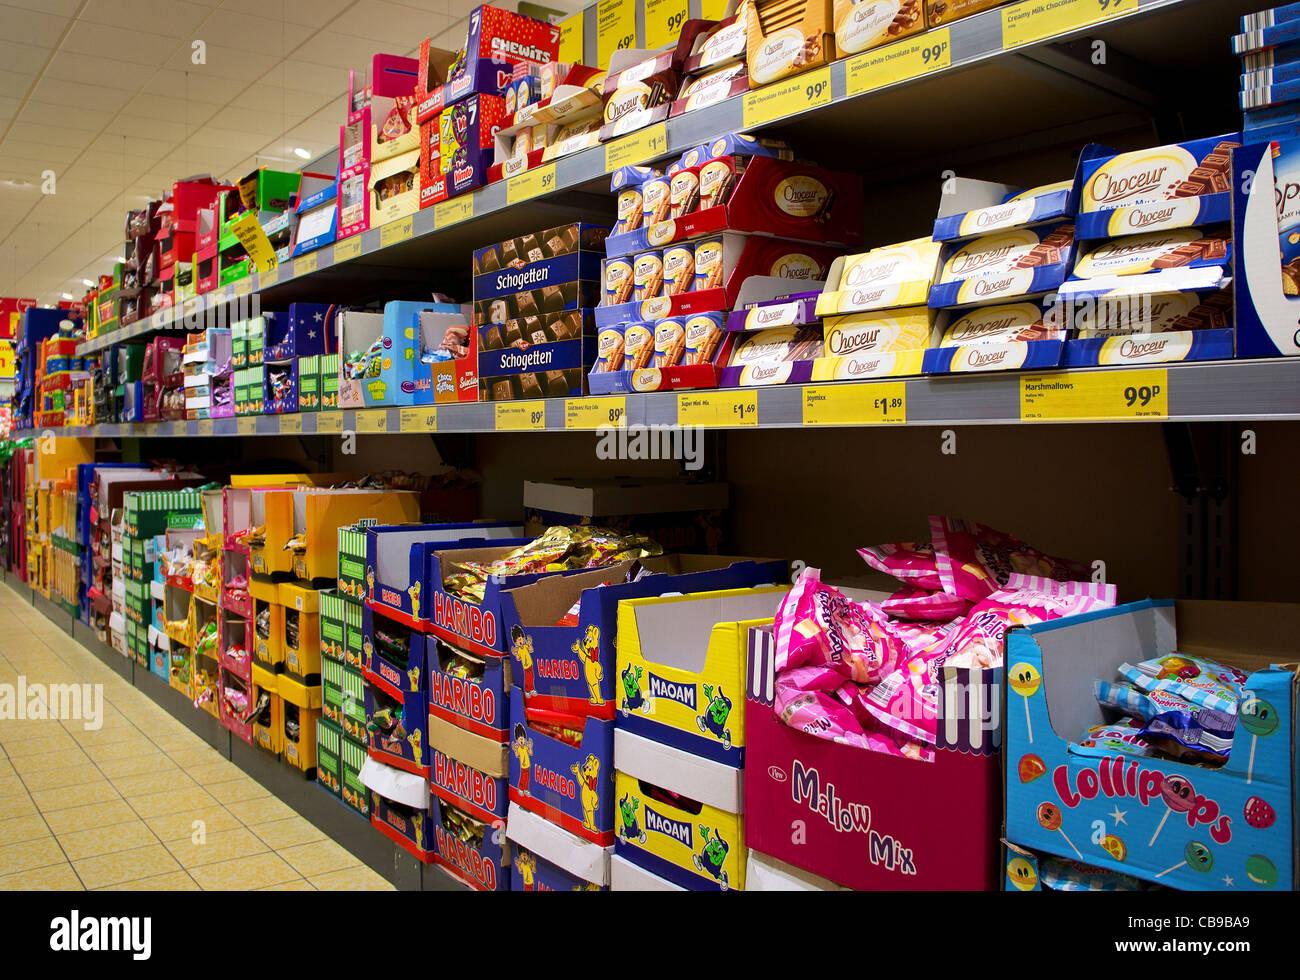 shelves in an Aldi store, UK Stock Photo